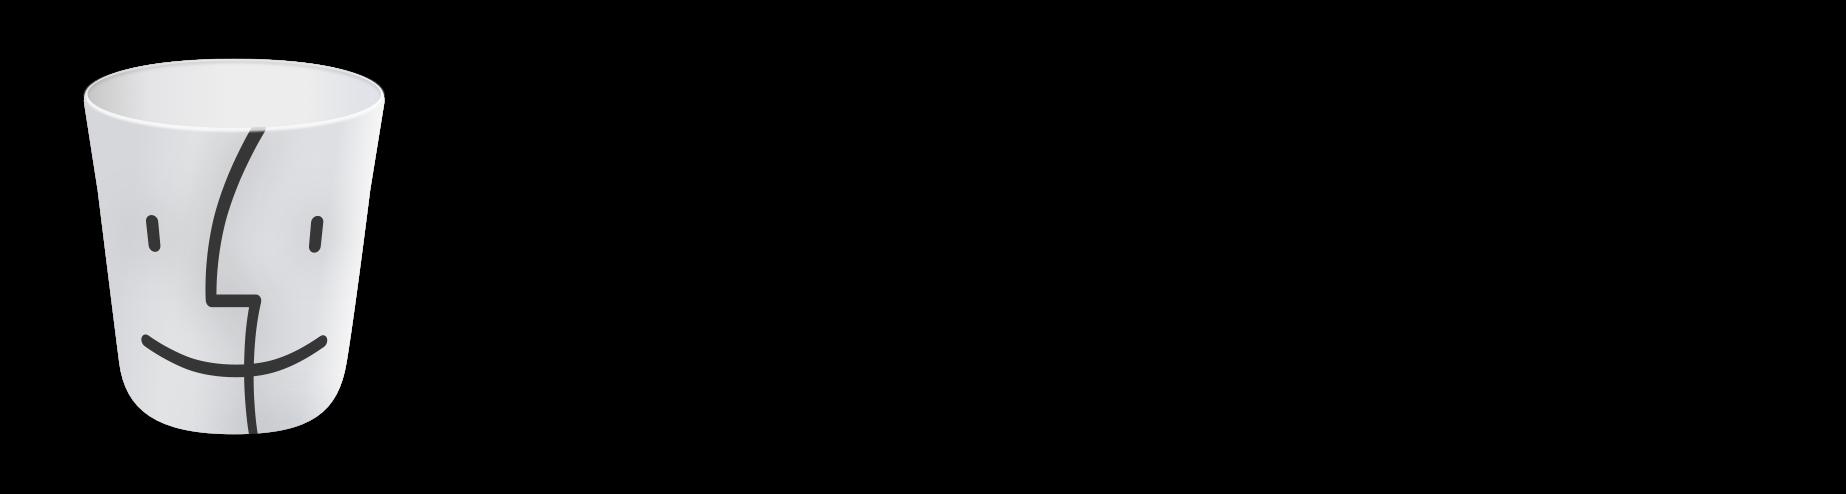 rm-protection logo